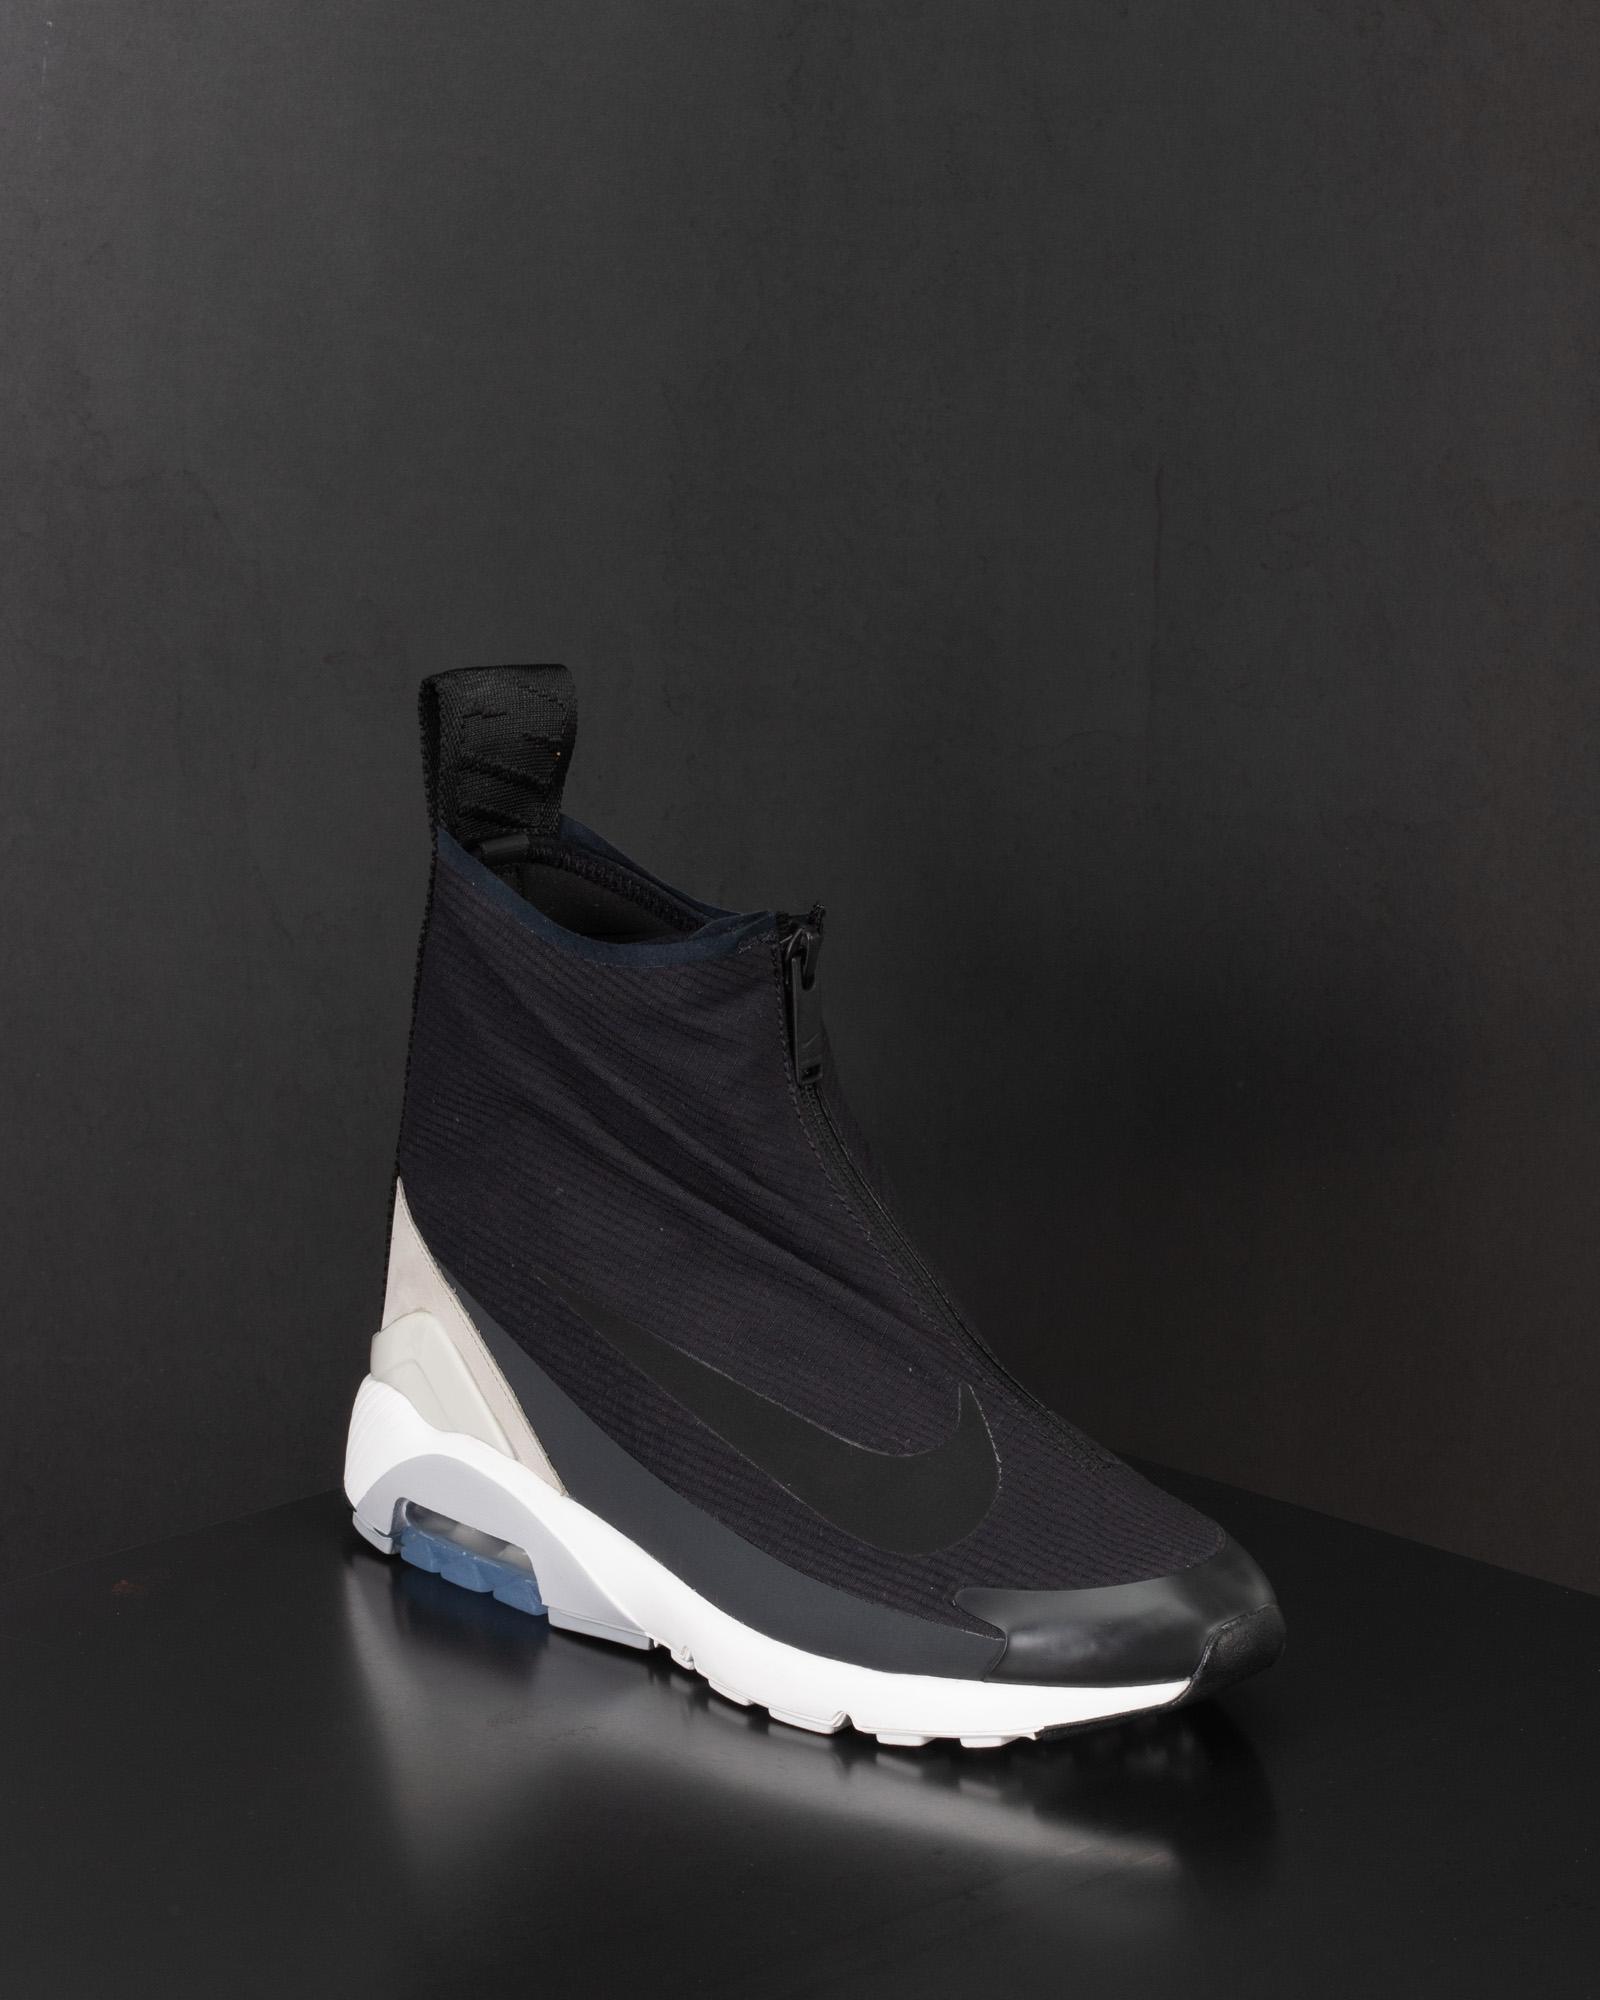 New Nike X Ambush Unisex Air Max 180 HI Shoes Sneakers BV0145-001 Black